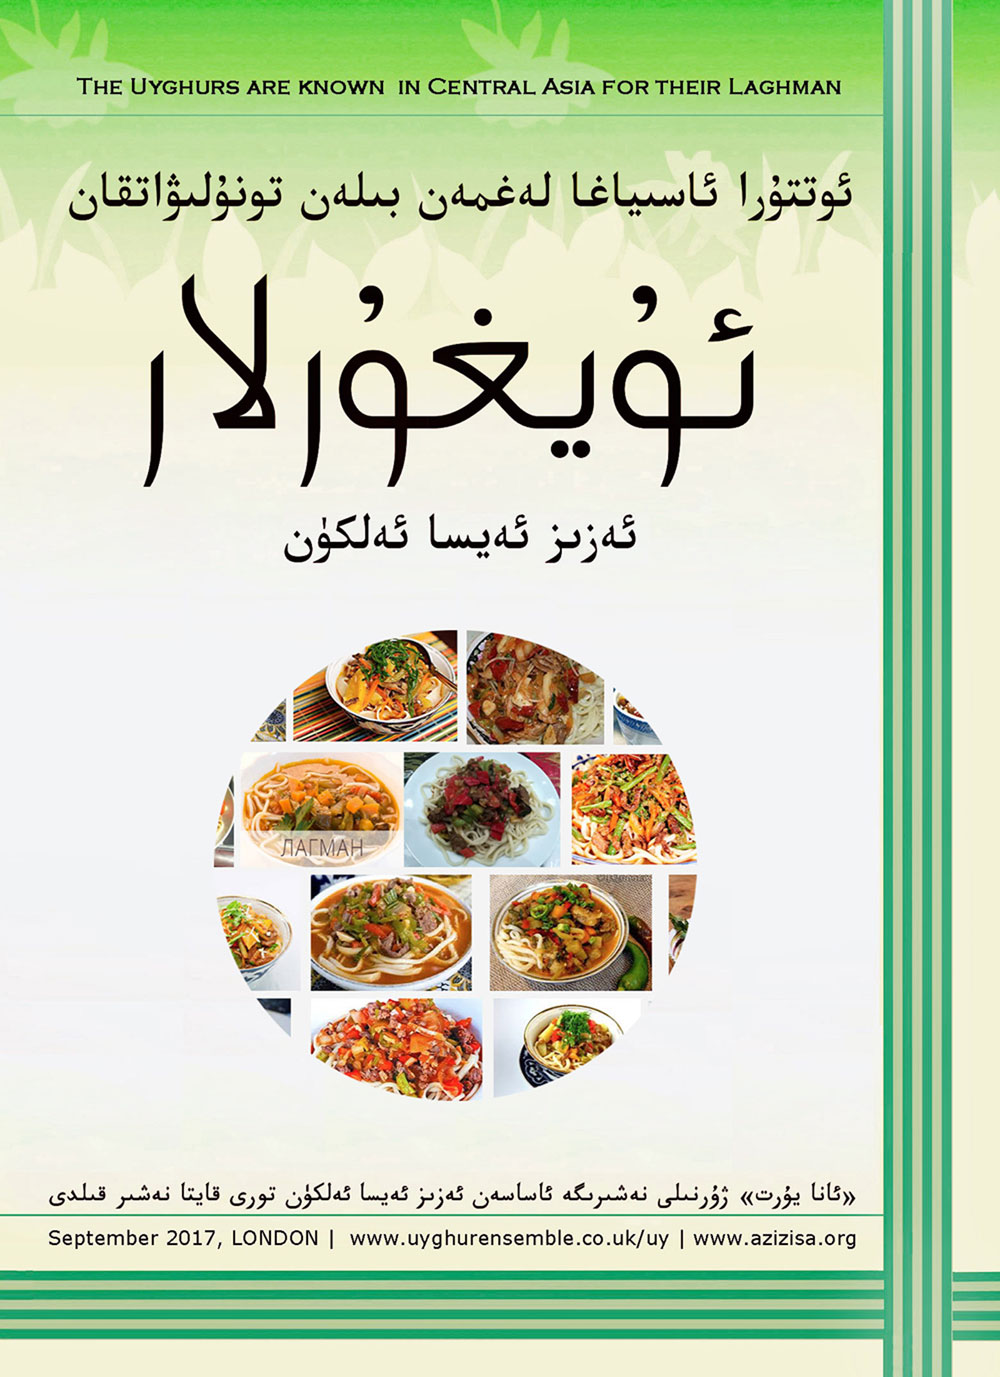 Uyghur Leghmen - ئوتتۇرا ئاسىياغا لەغمەن بىلەن تونۇلىۋاتقان ئۇيغۇرلار